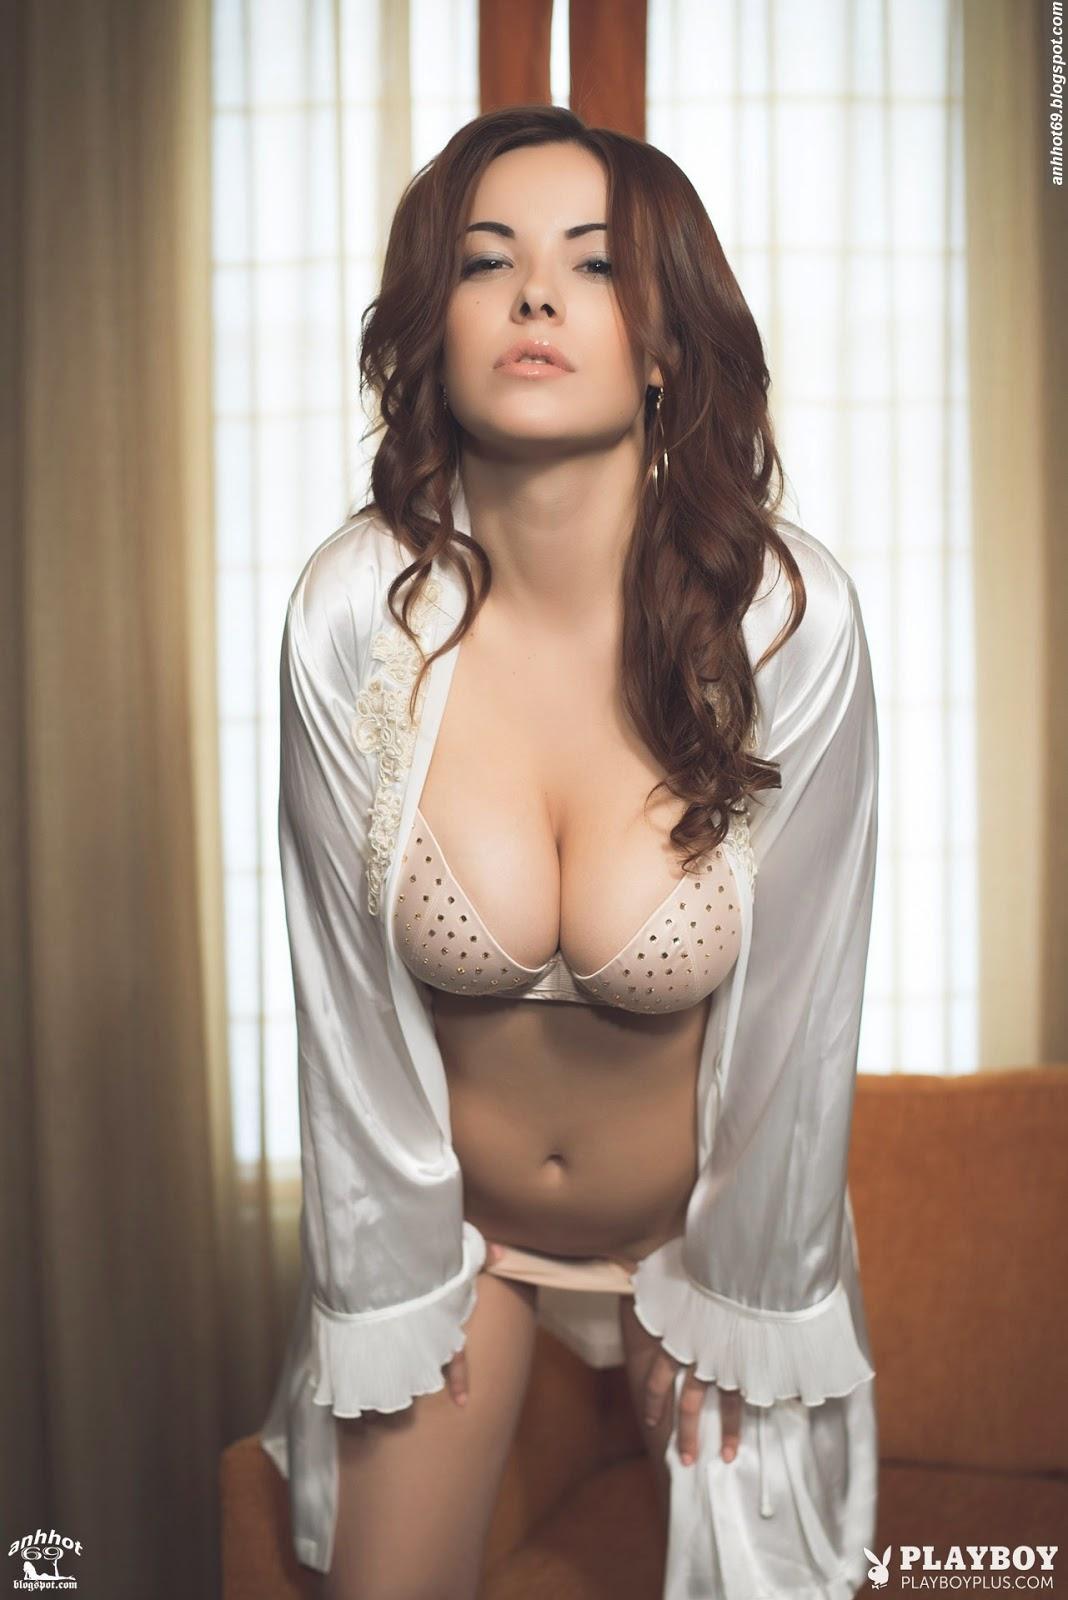 [TWW-1504292325] - Elizabeth Marxs Luscious Body Nude